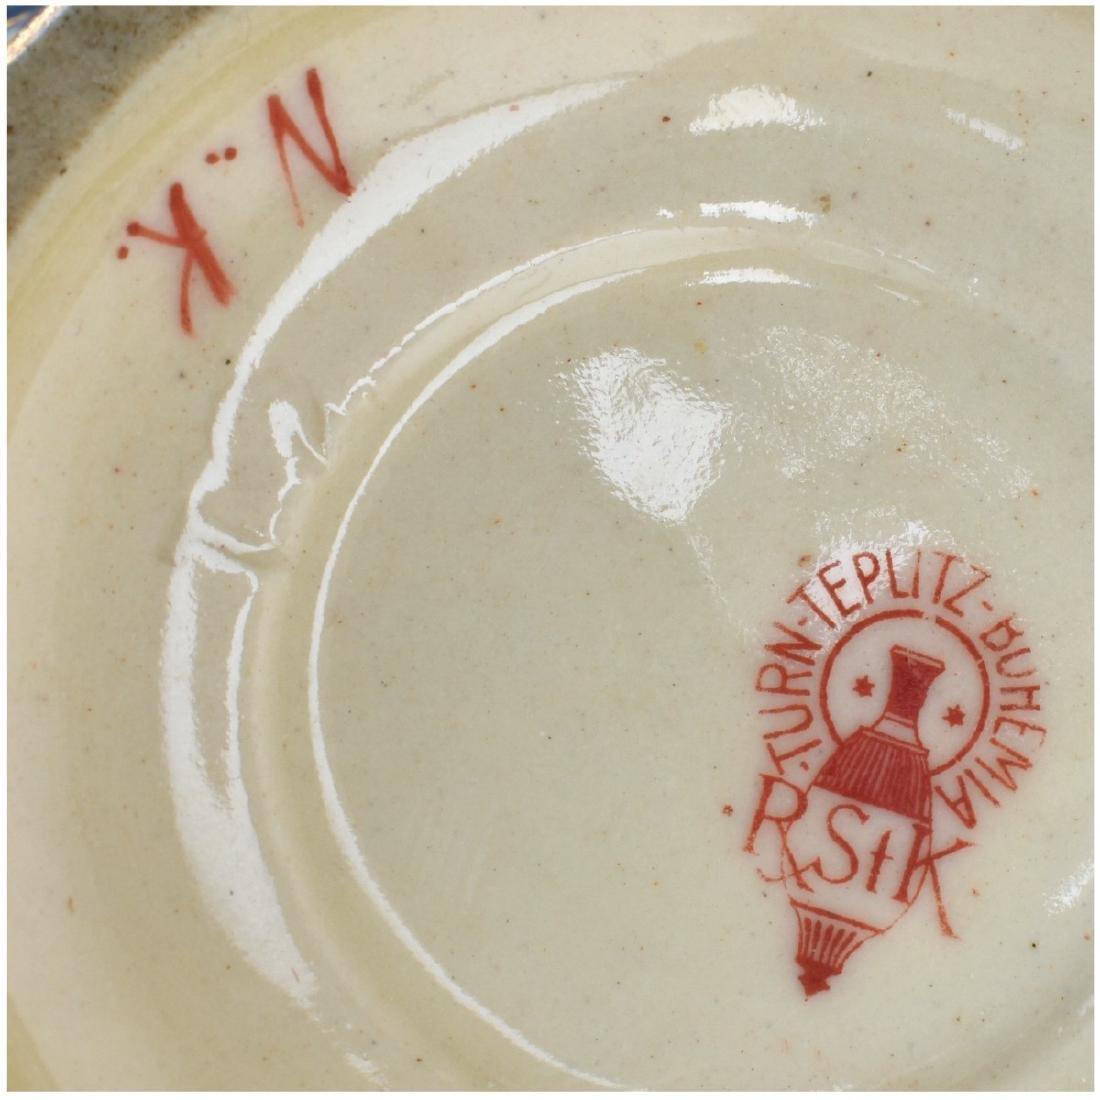 Turn Teplitz Amphora Porcelain Maiden Vase - 6